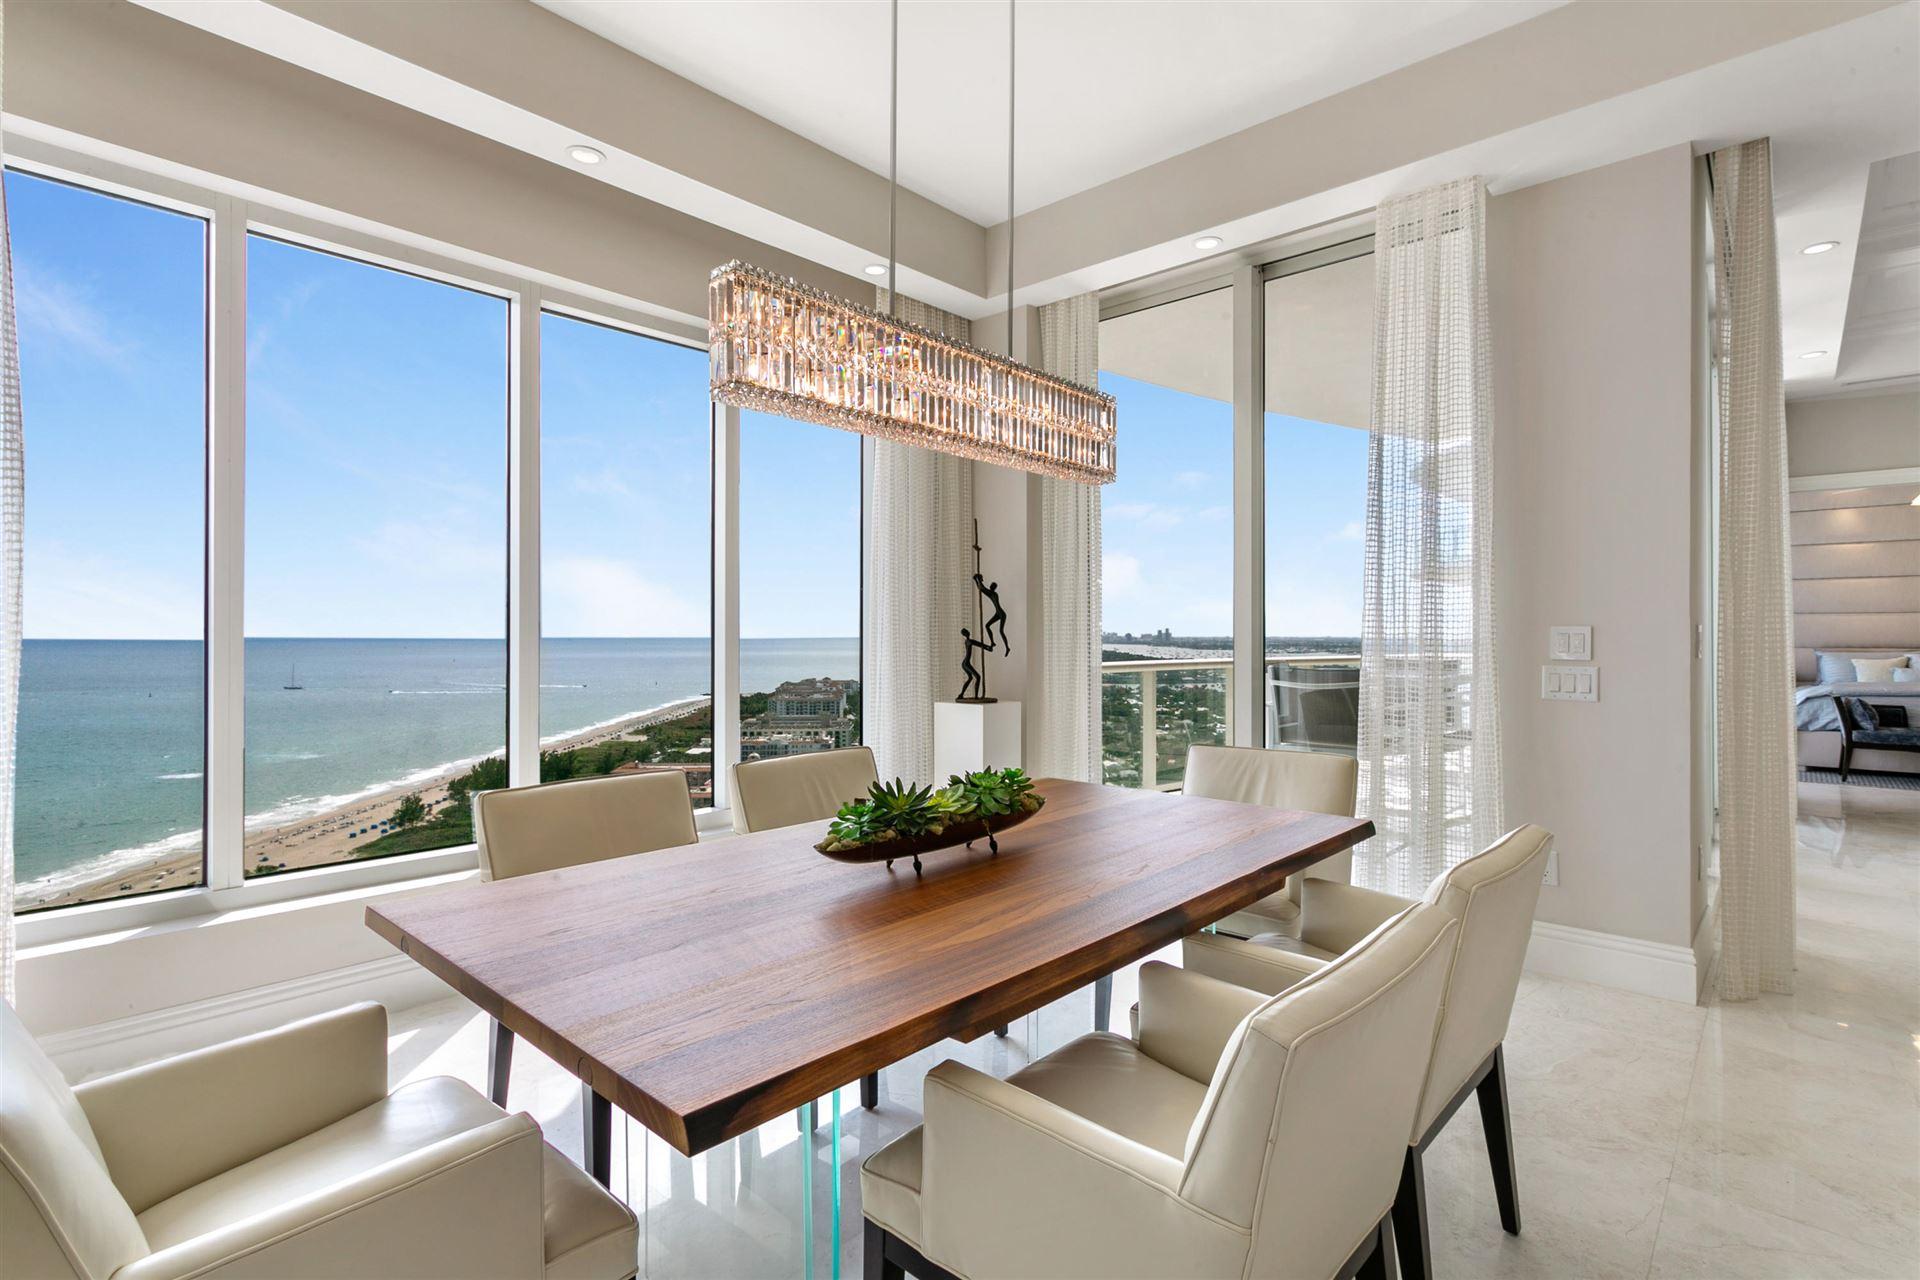 Photo of 2700 N Ocean Lph2b Drive SE #Lph2b, Riviera Beach, FL 33404 (MLS # RX-10697020)